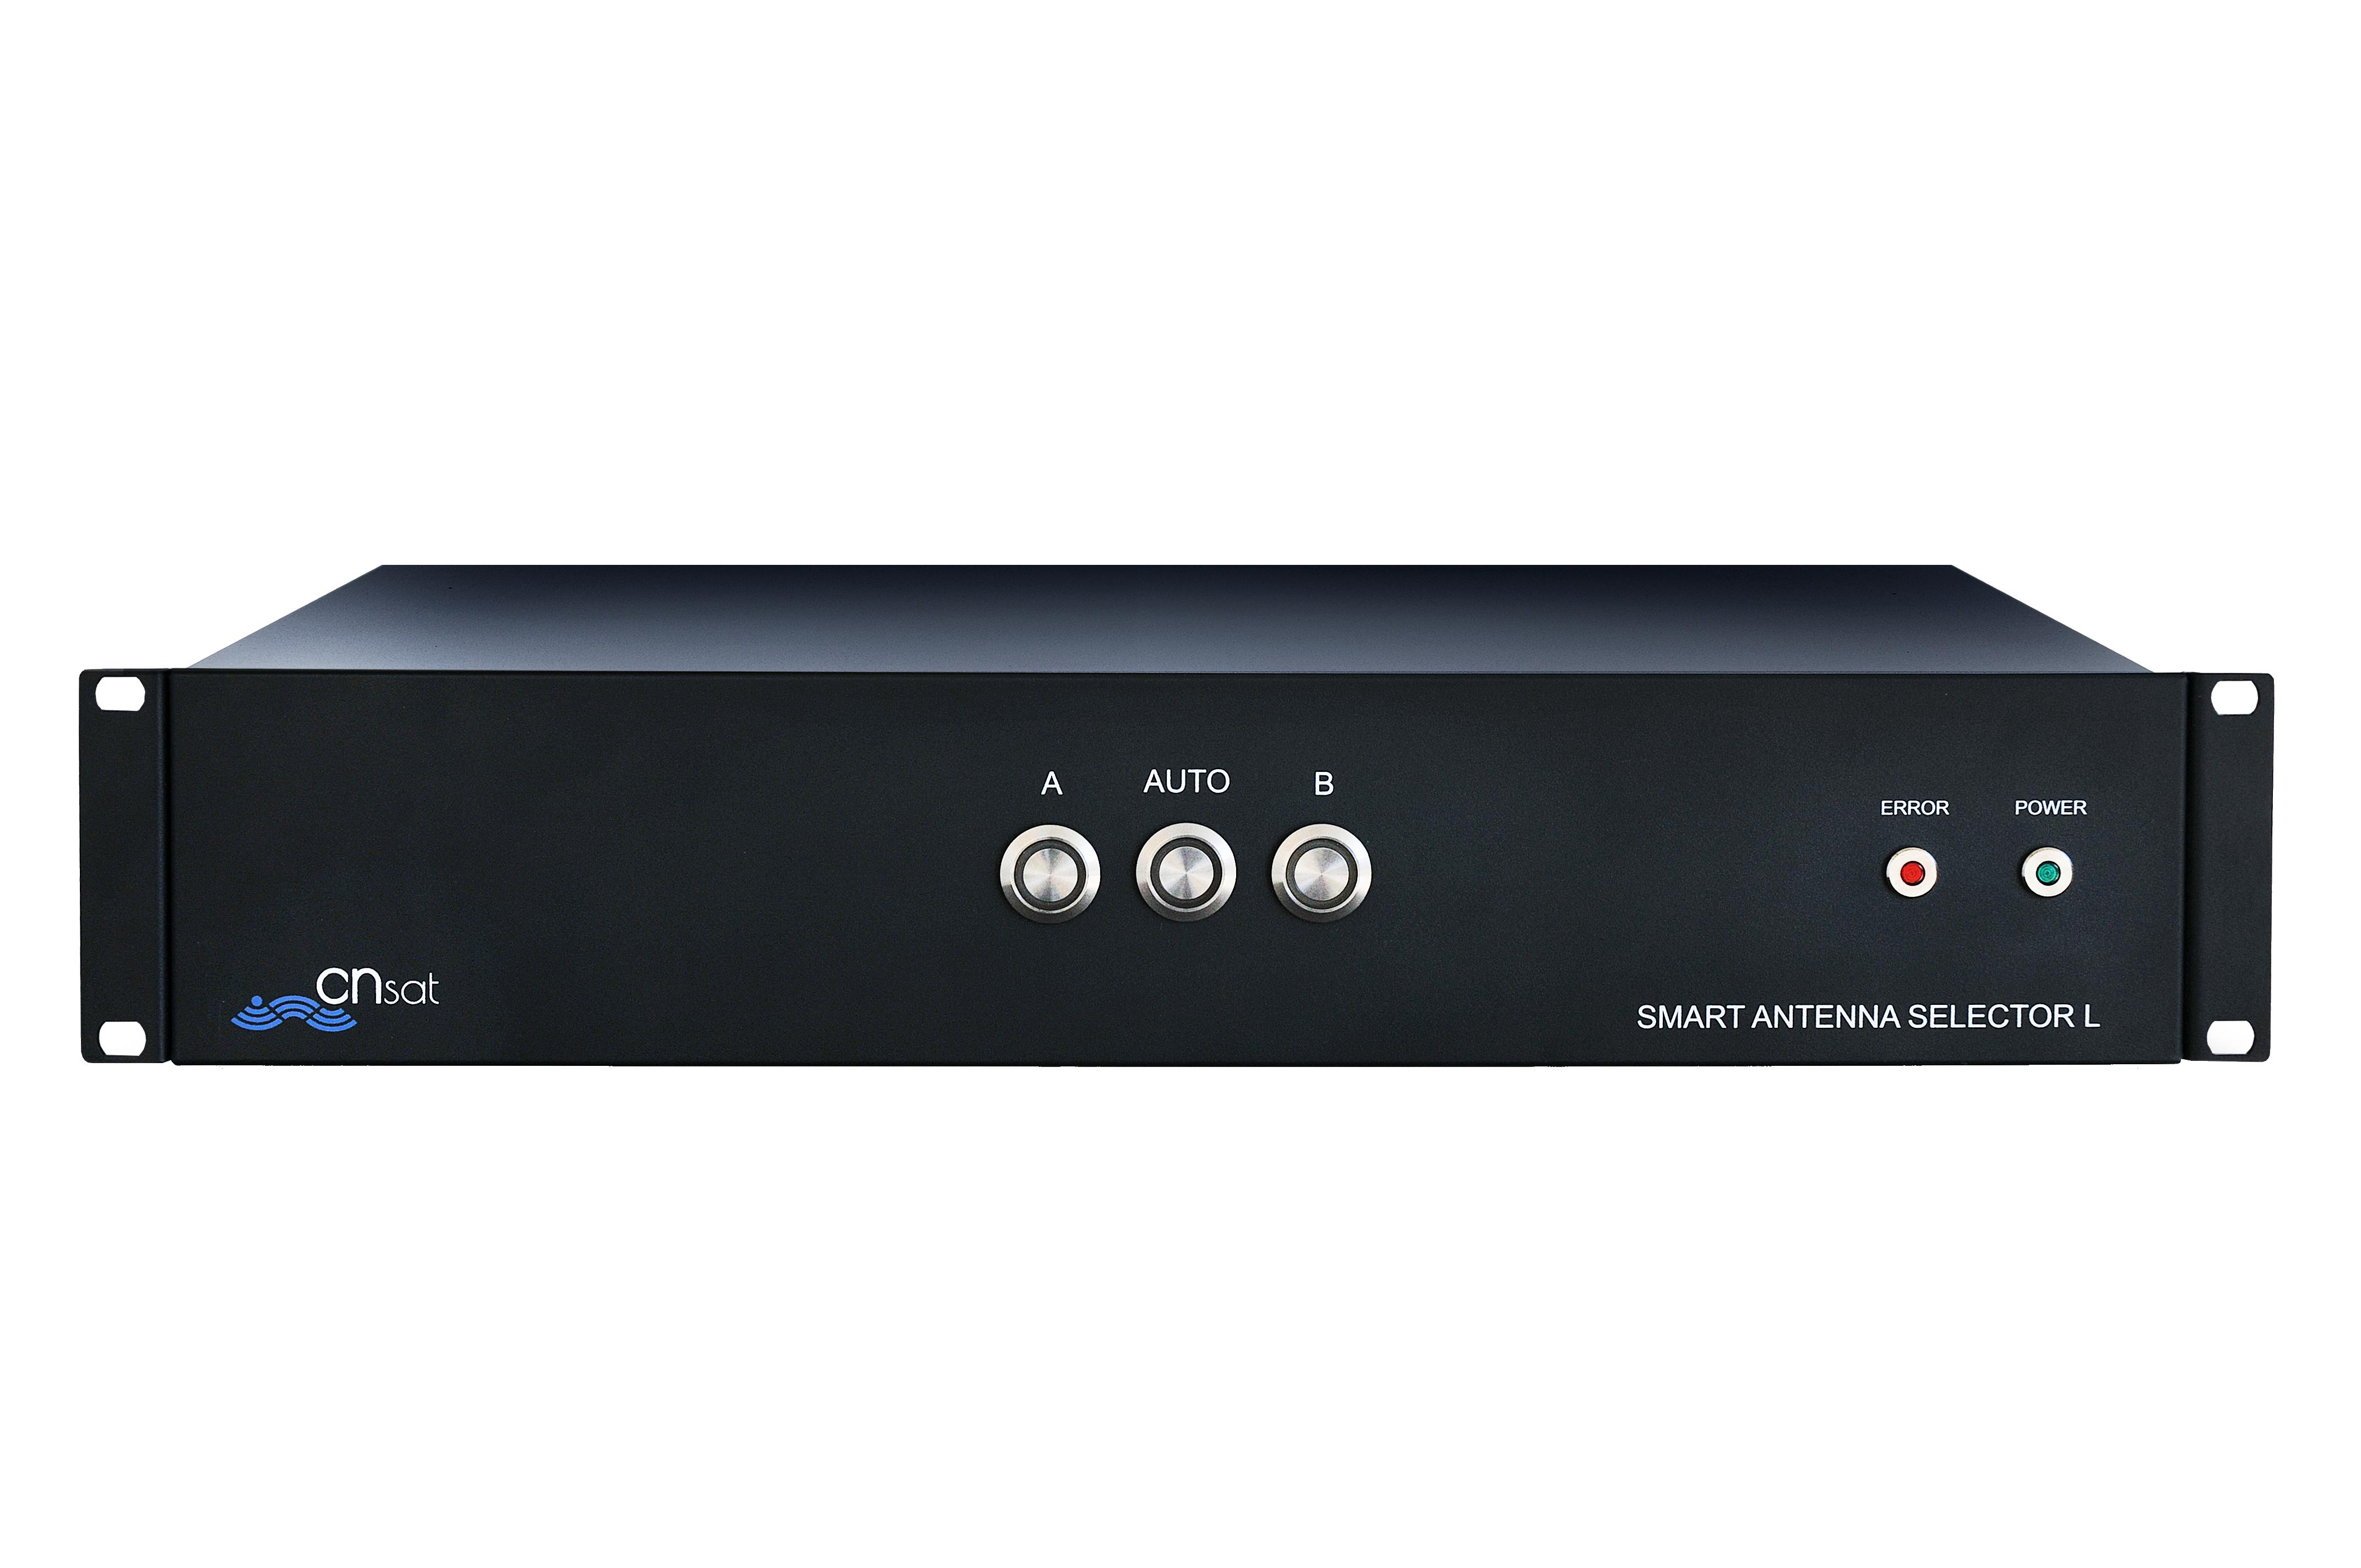 Smart Antenna Selector Light Cnsat Srl Antennas Automatic Manual And Compact